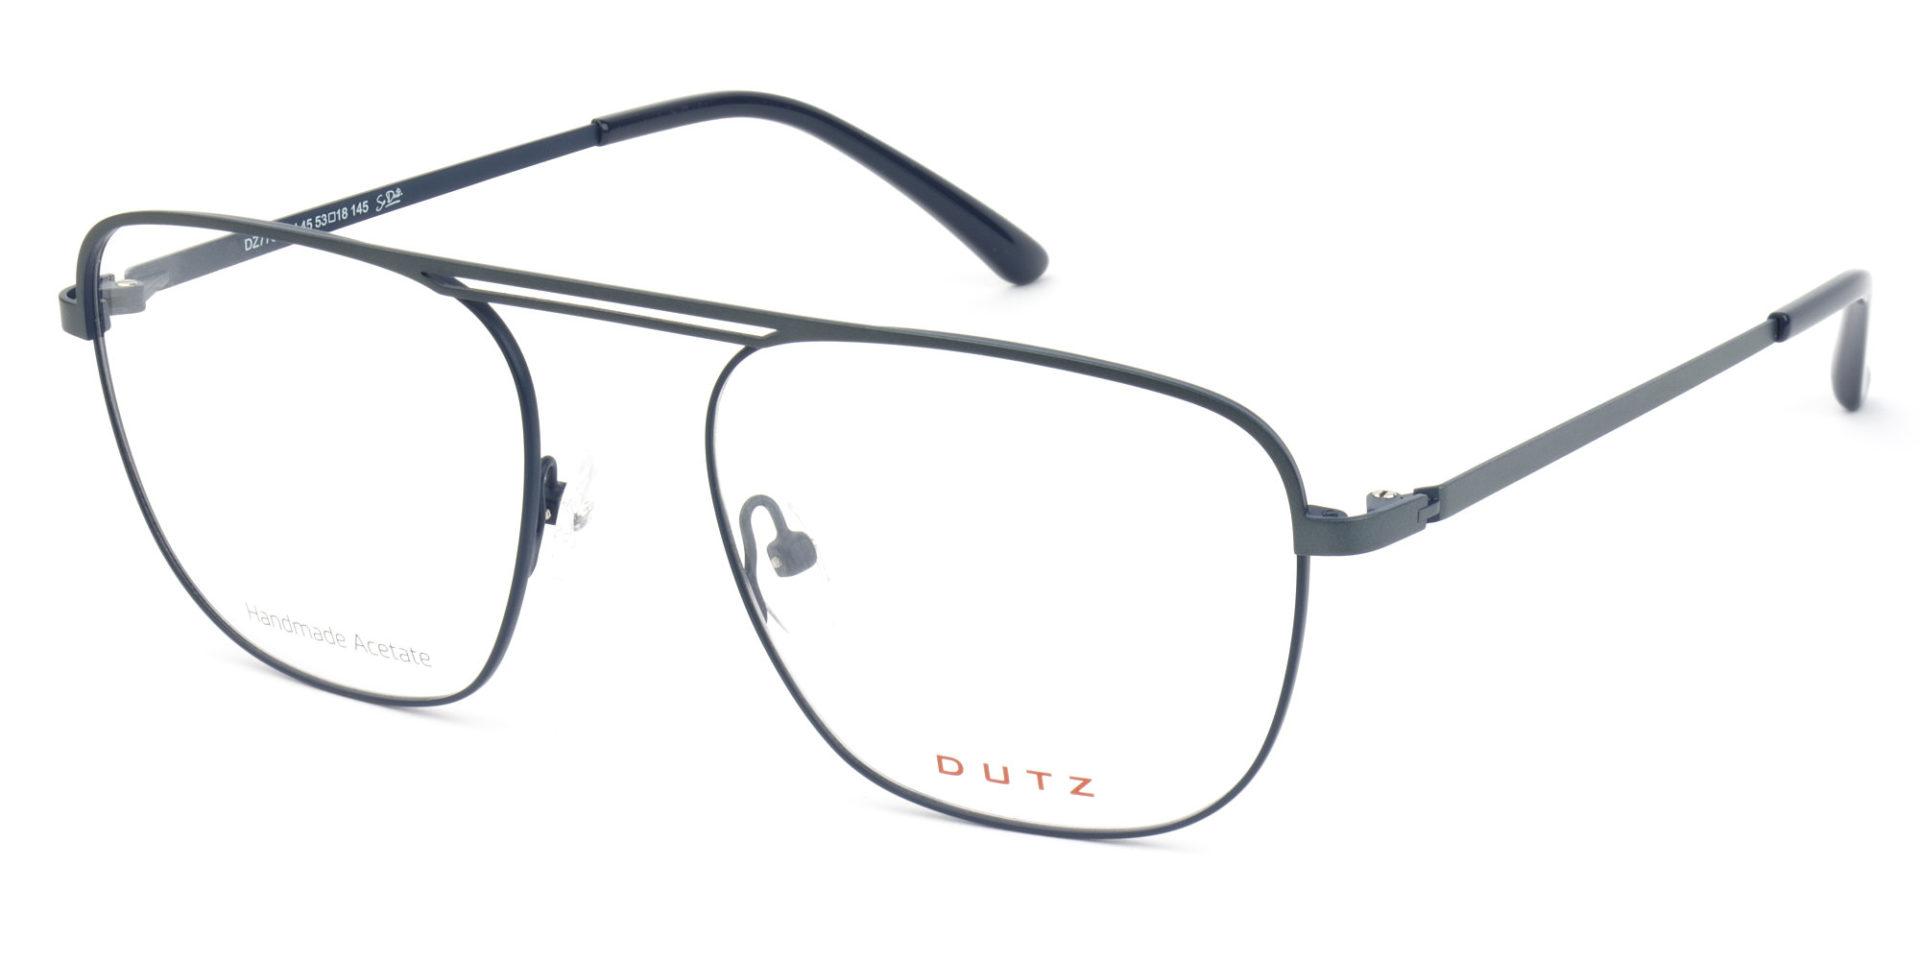 DZ776-45